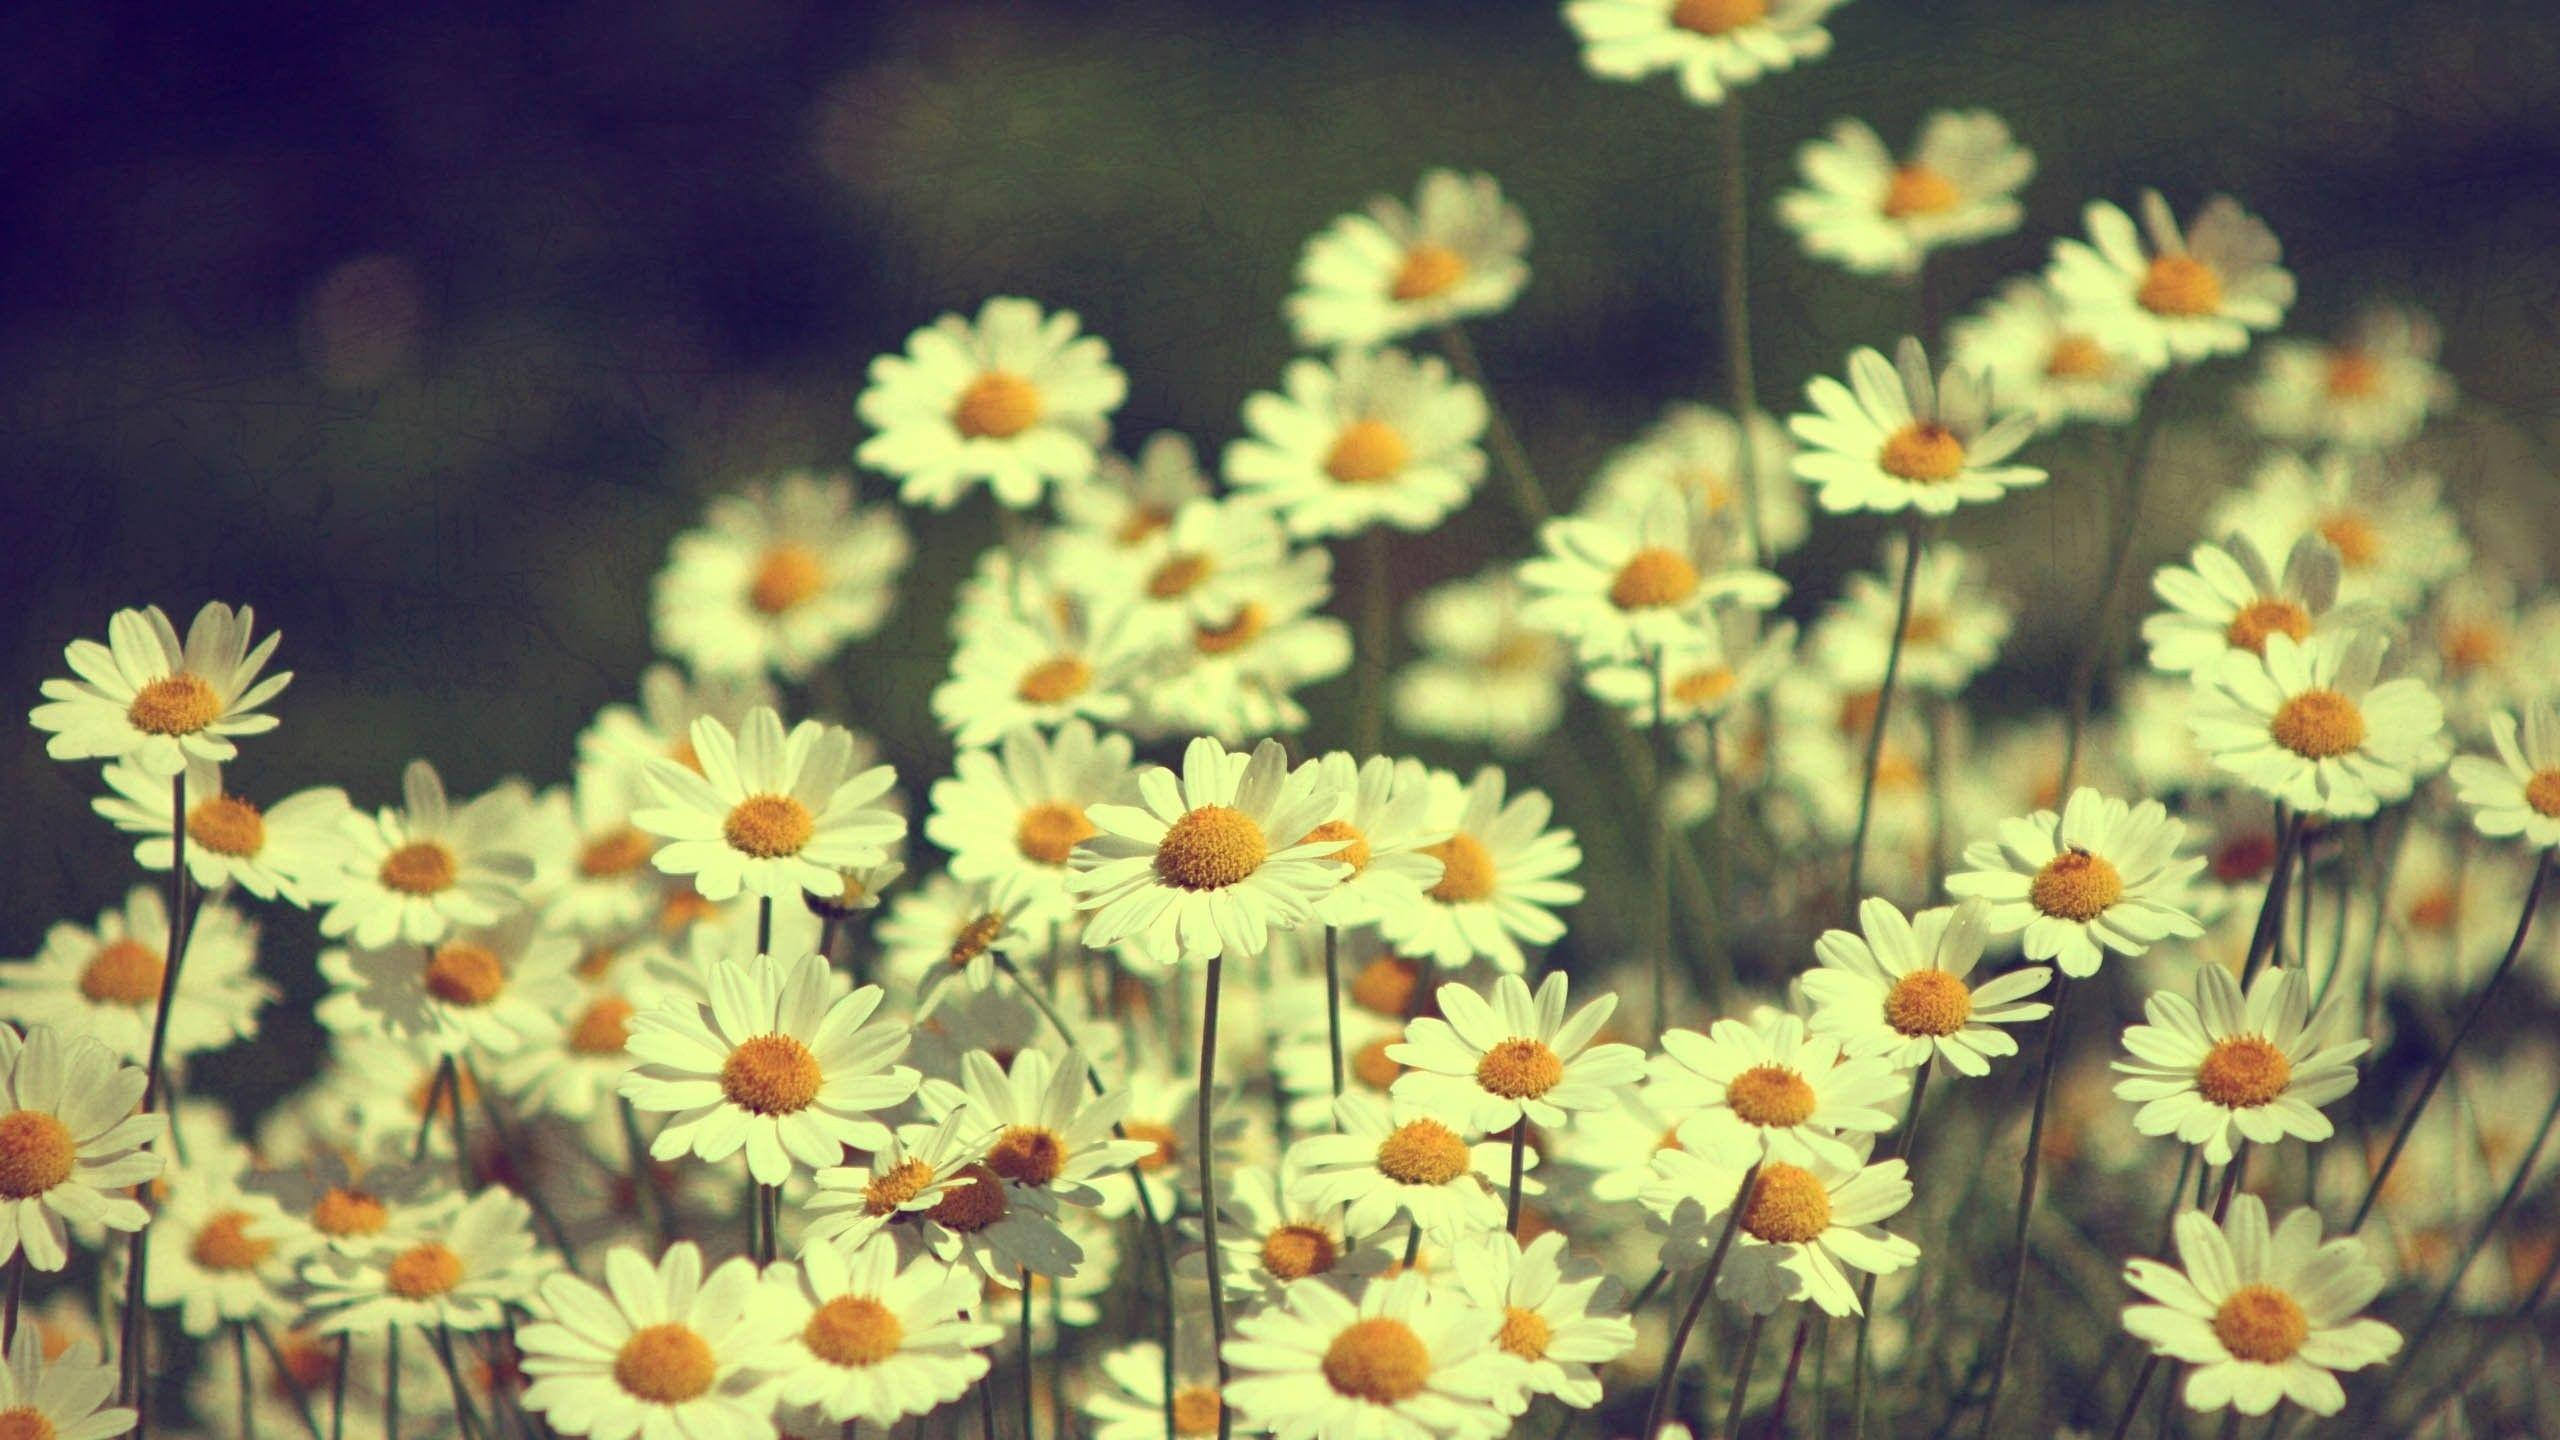 Vintage Flowers Wallpapers - Wallpaper Cave Vintage Flower Background Tumblr